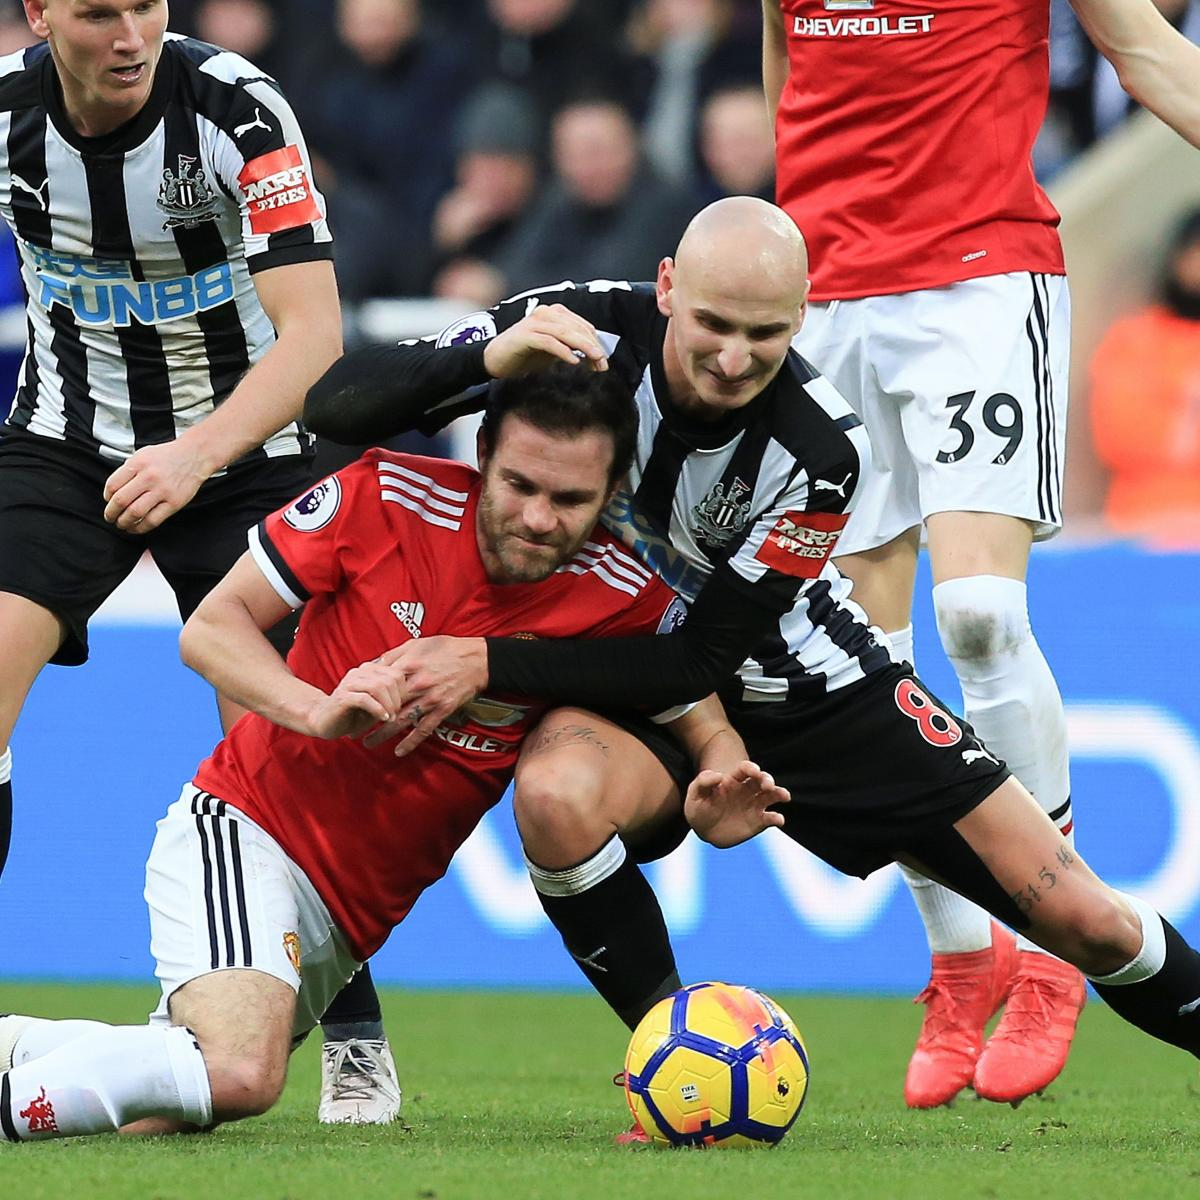 Liverpool News When Did The Premier League S Finest: Premier League Results Week 27: Sunday's 2018 EPL Scores